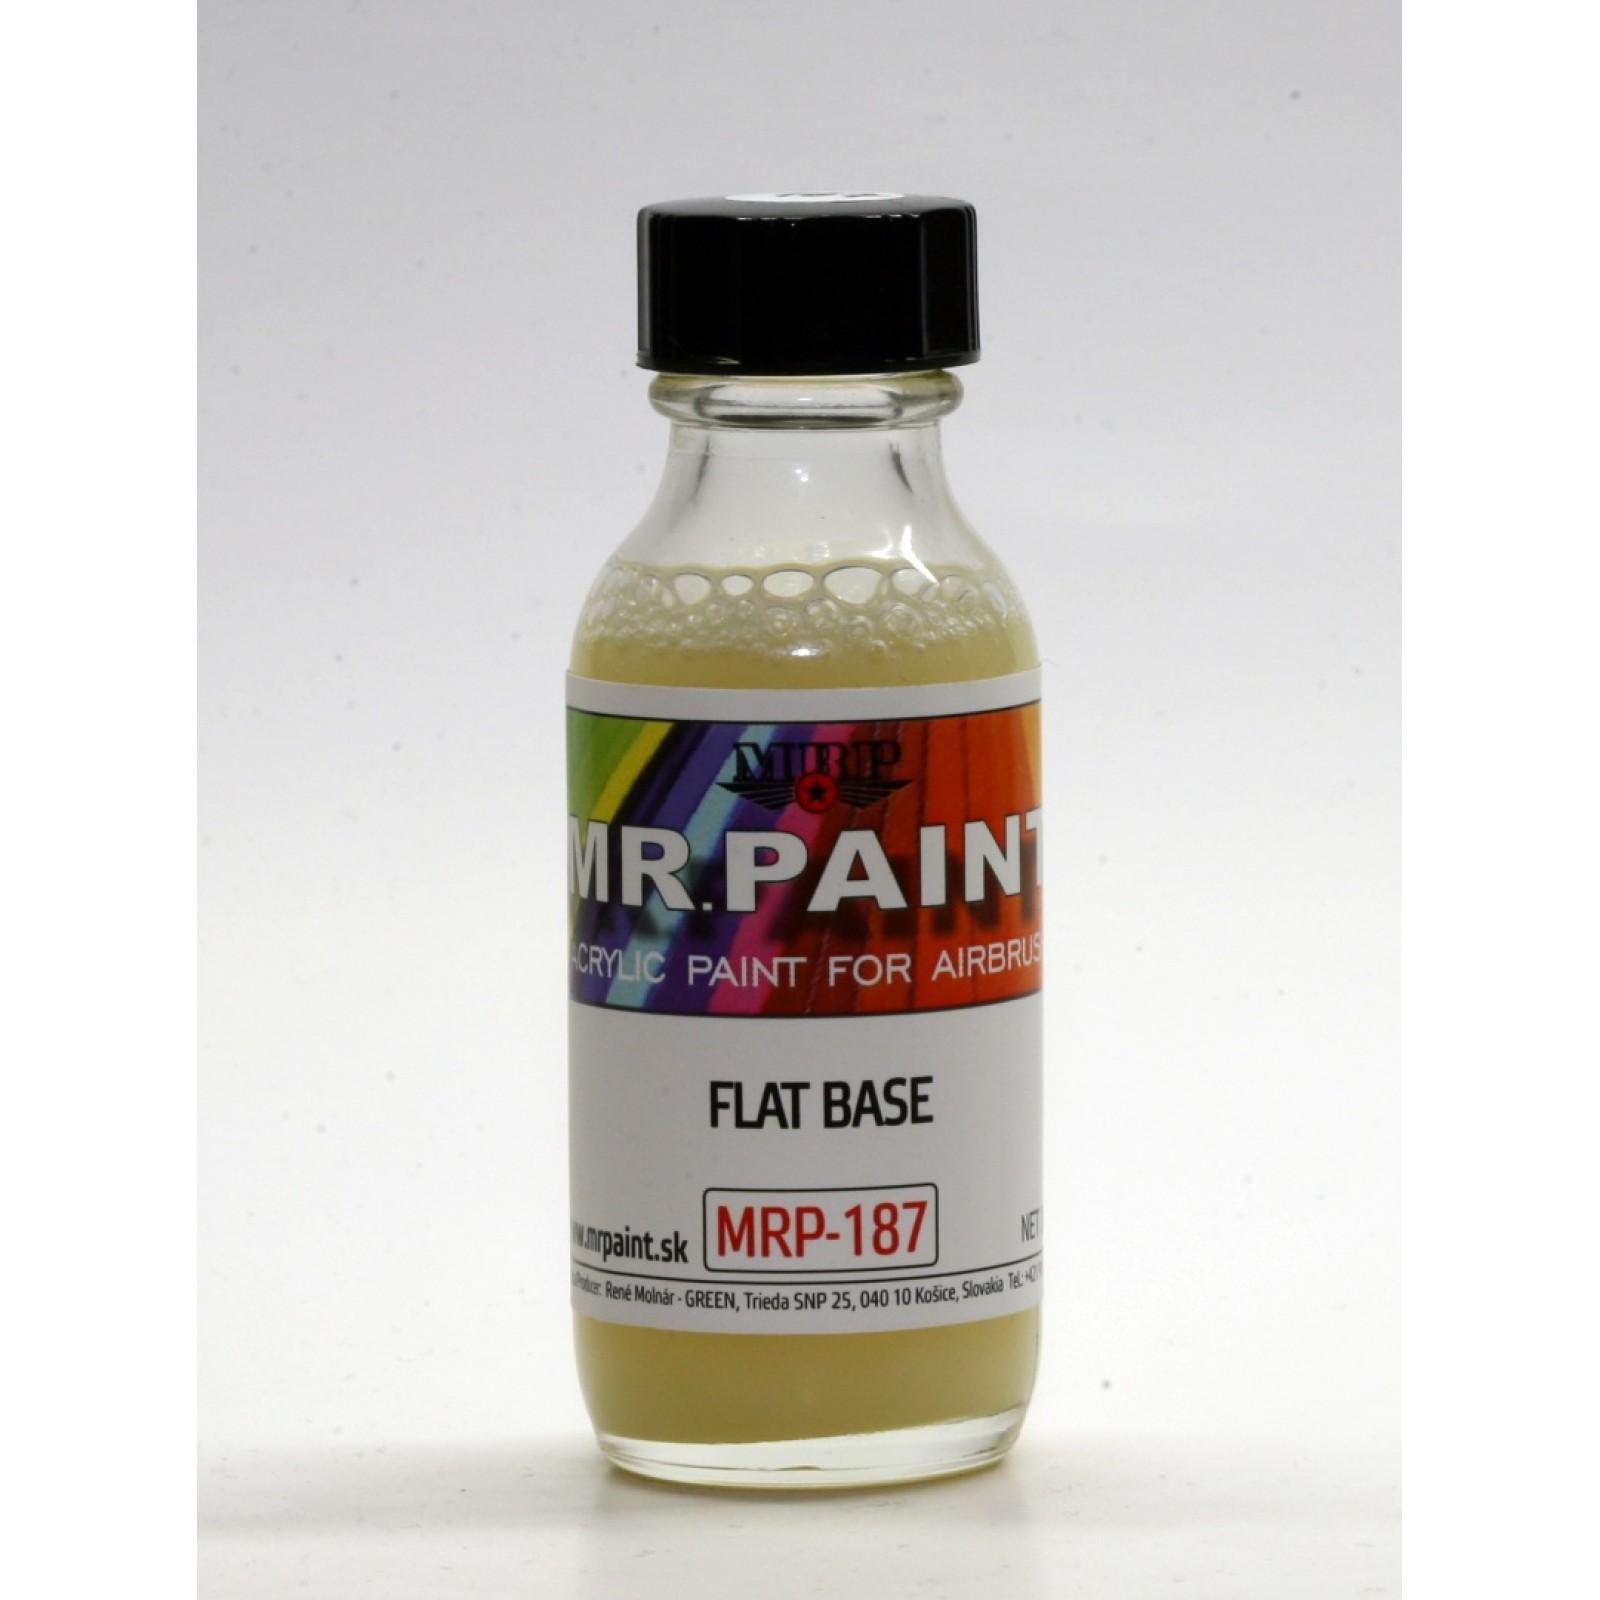 MRP-187 FLAT BASE